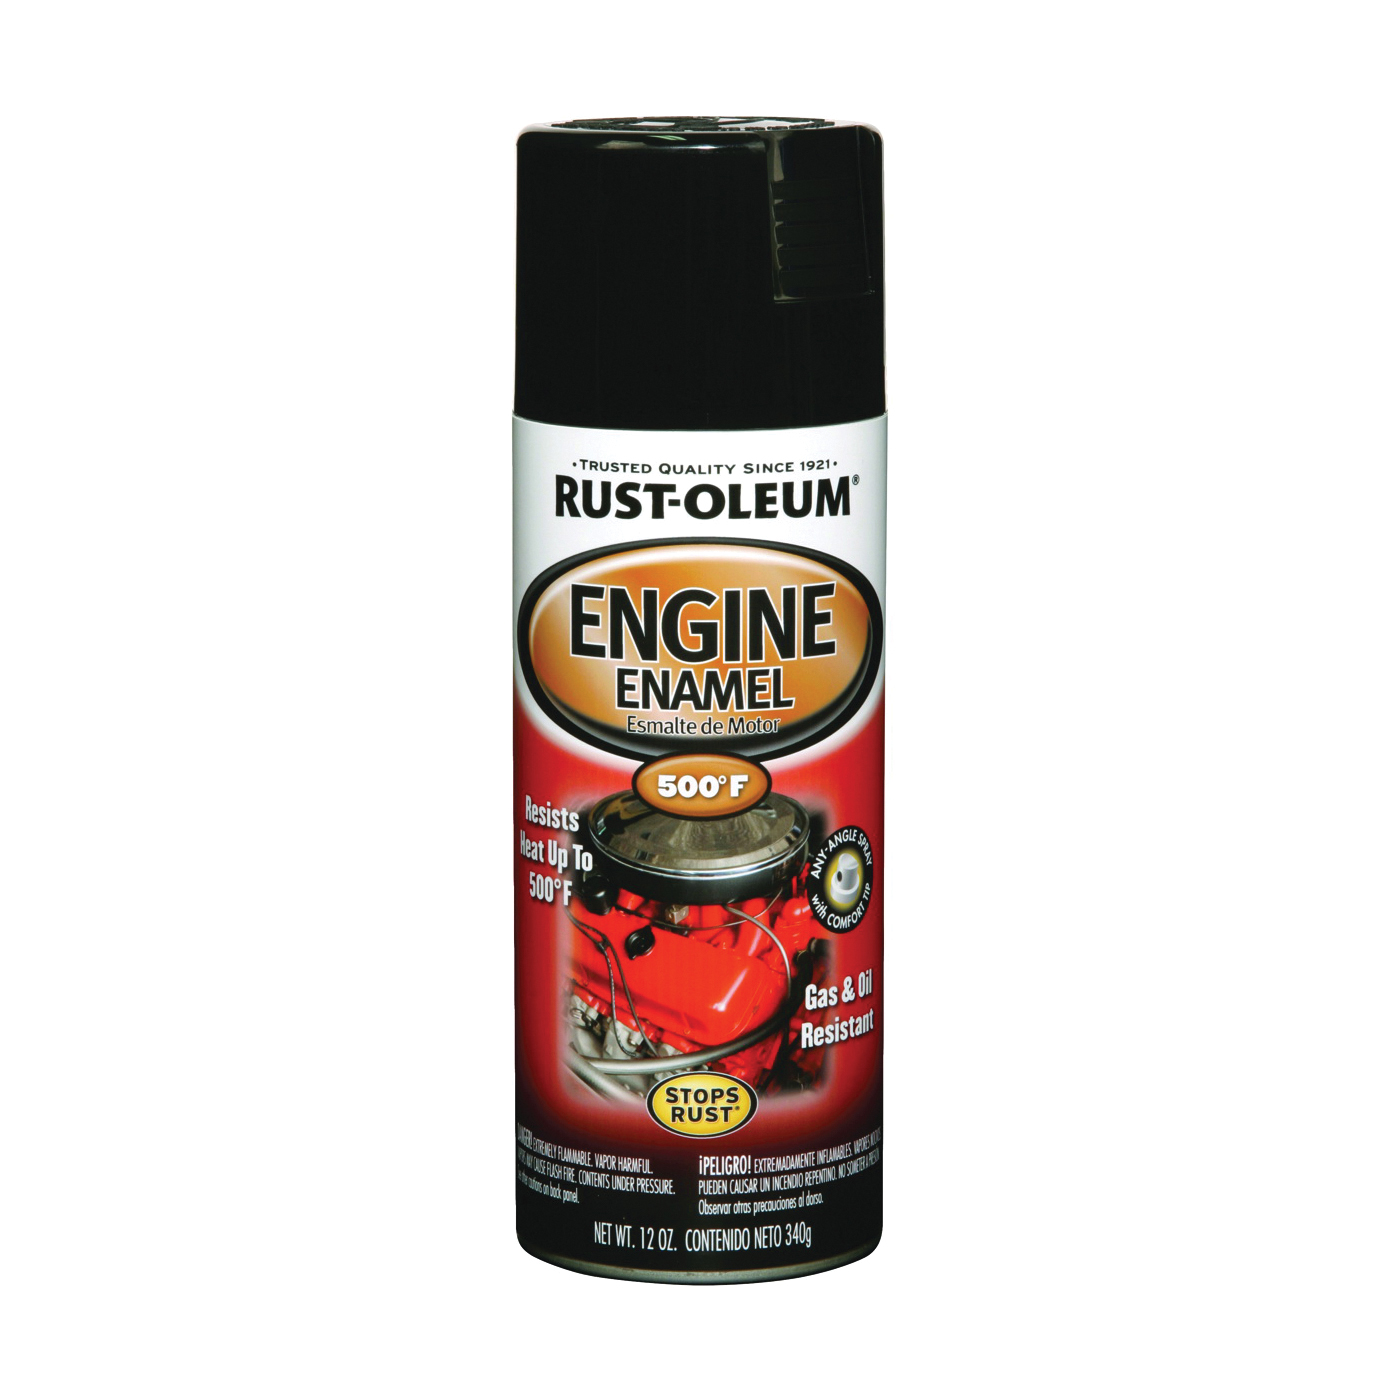 Picture of RUST-OLEUM AUTOMOTIVE 248932 Engine Enamel Spray Paint, Black, 12 oz, Aerosol Can